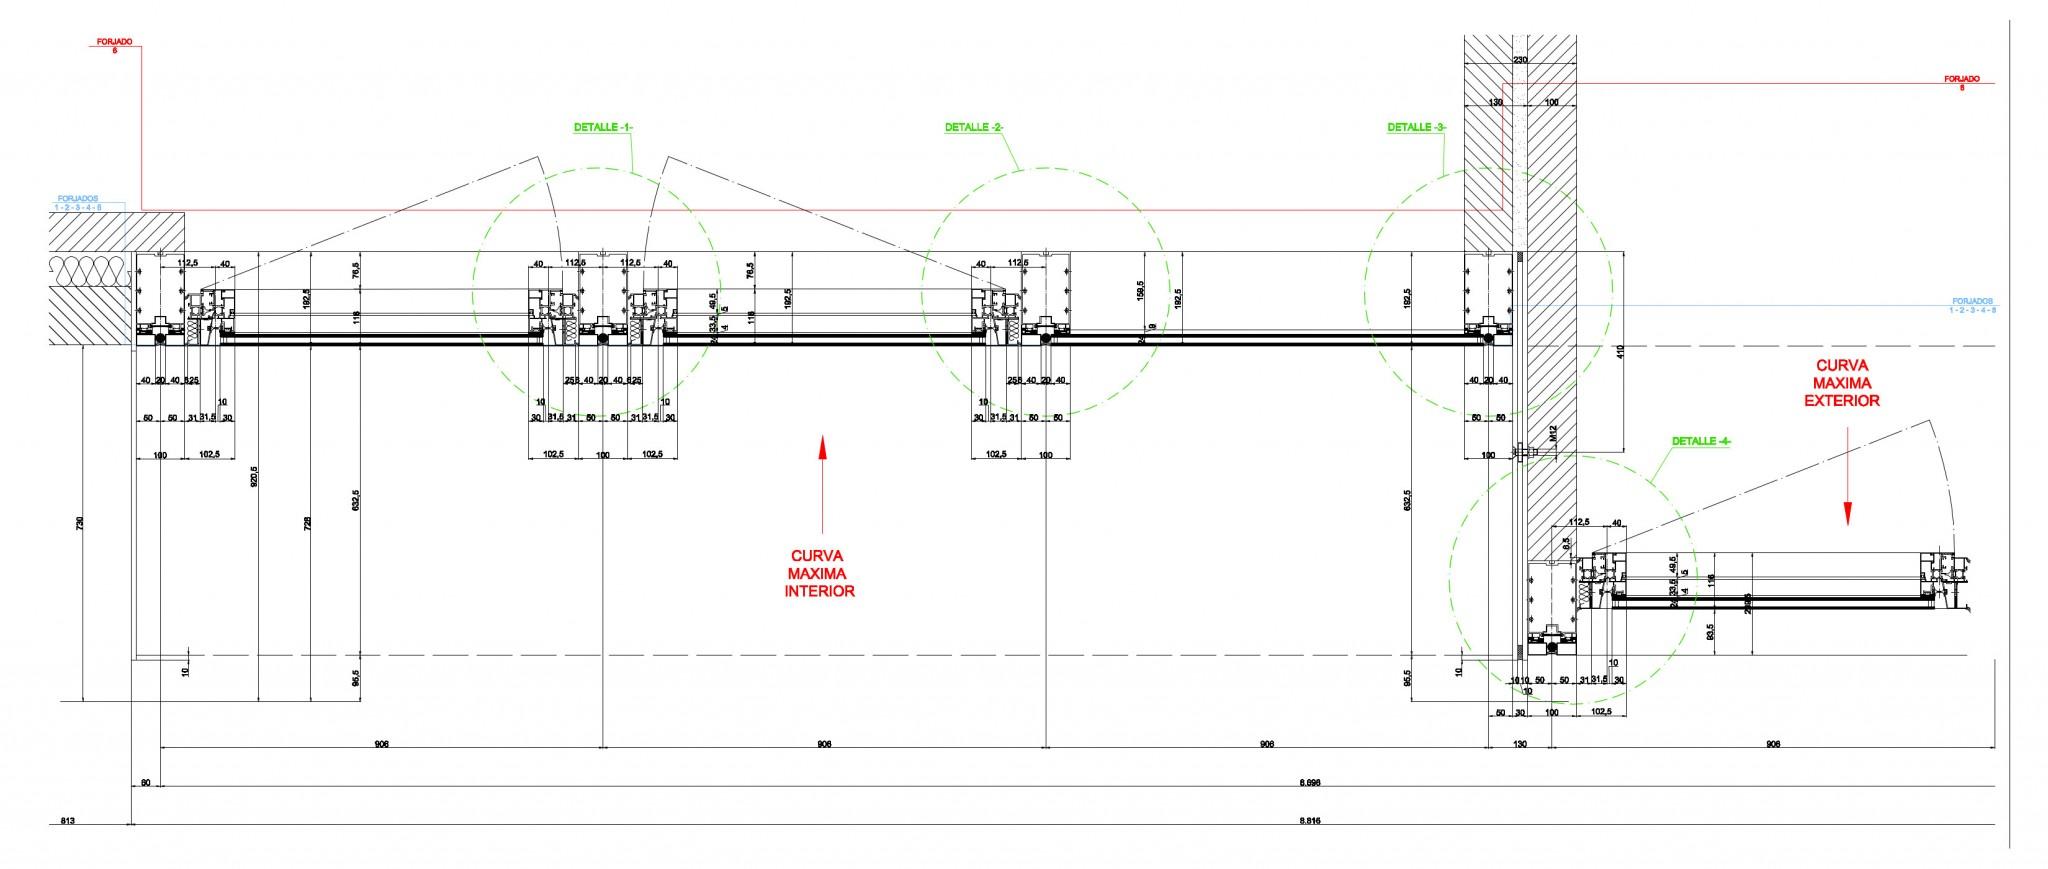 Detalle constructivo muro cortina _ viviendas-hurtado-amezaga-riventi_plano05